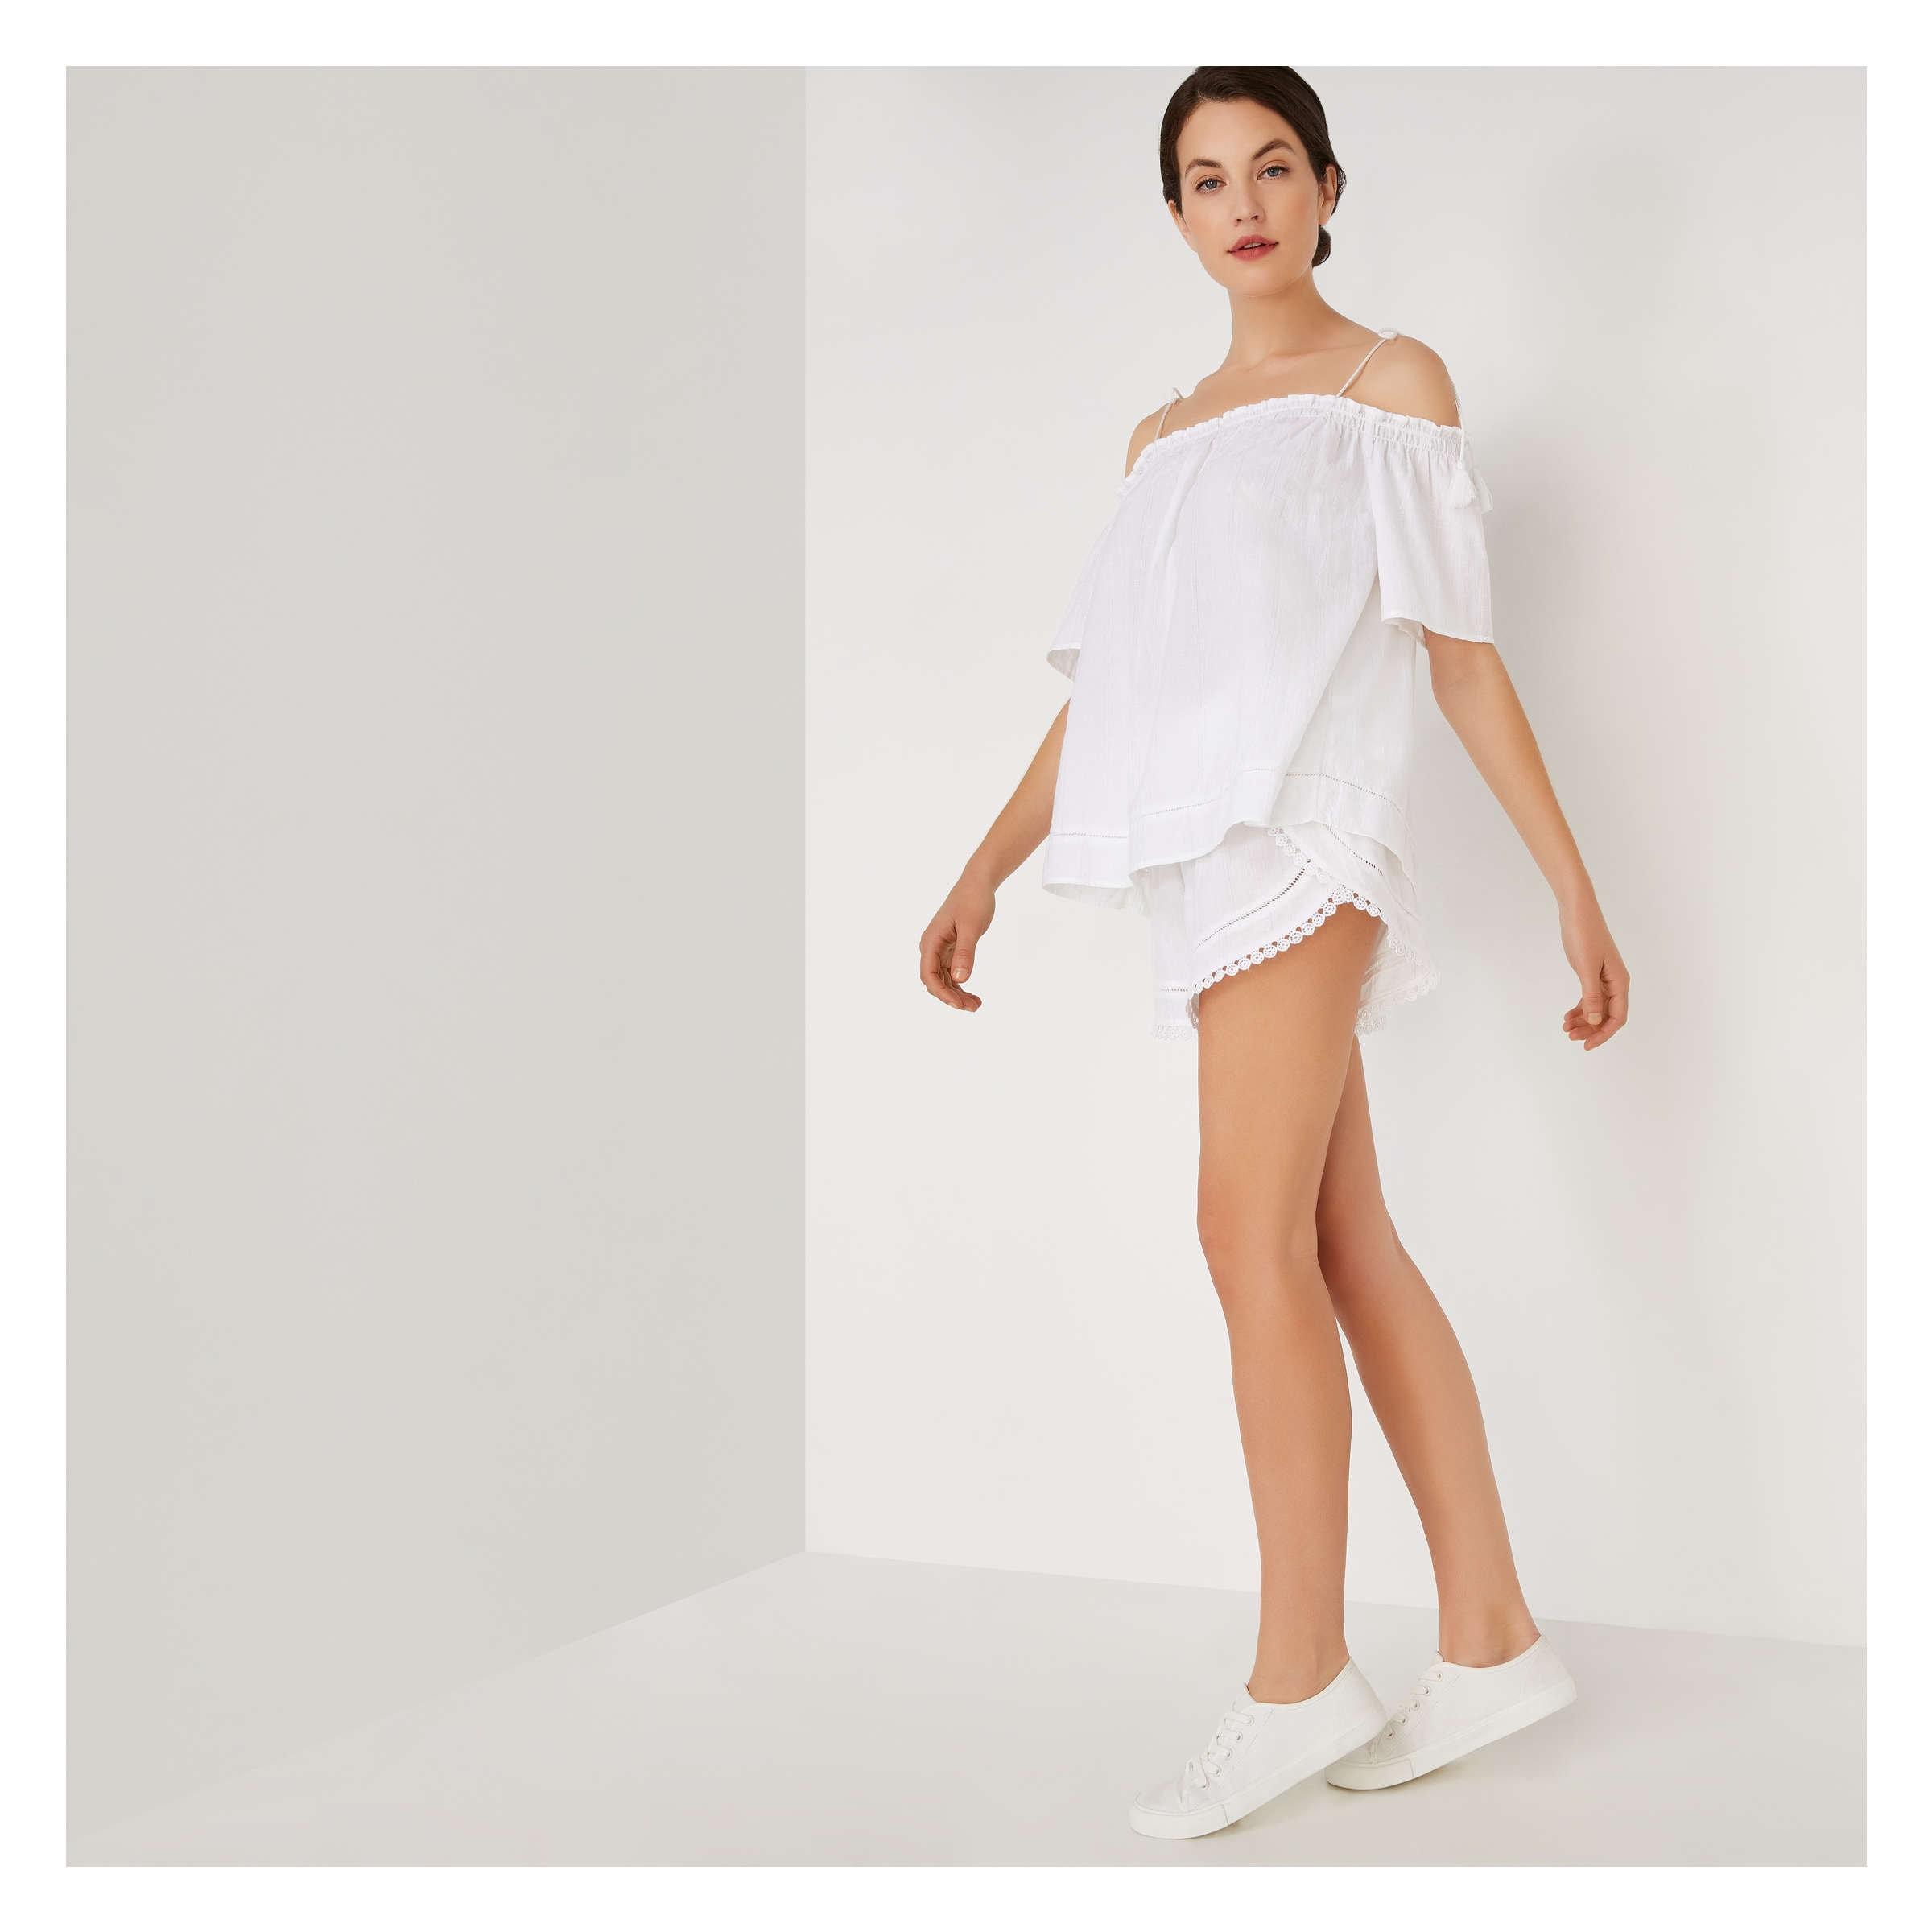 3f8ce443ee Overlap Beach Shorts in White from Joe Fresh